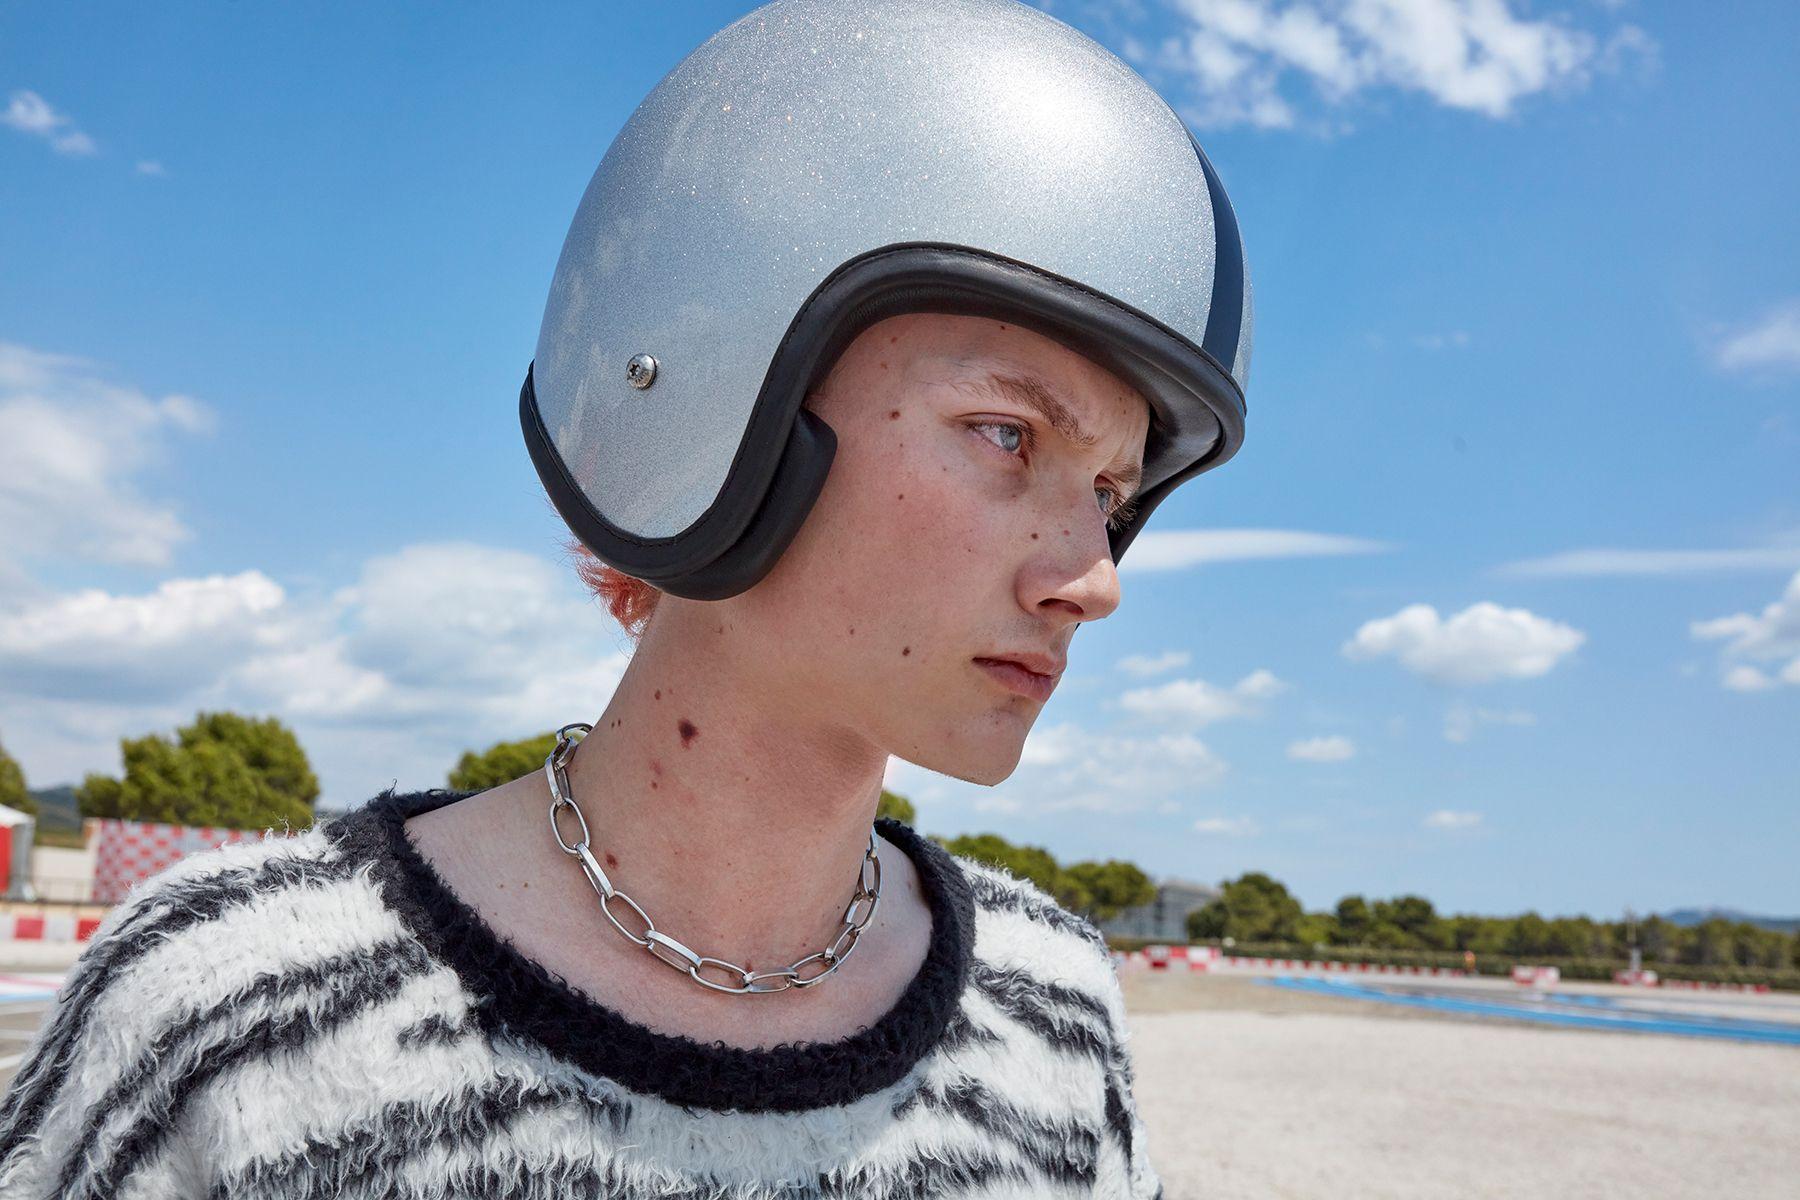 CELINE 2021春夏男裝系列:從憂鬱小生到自由奔放的滑板Boy,Hedi Slimane不一樣了嗎?